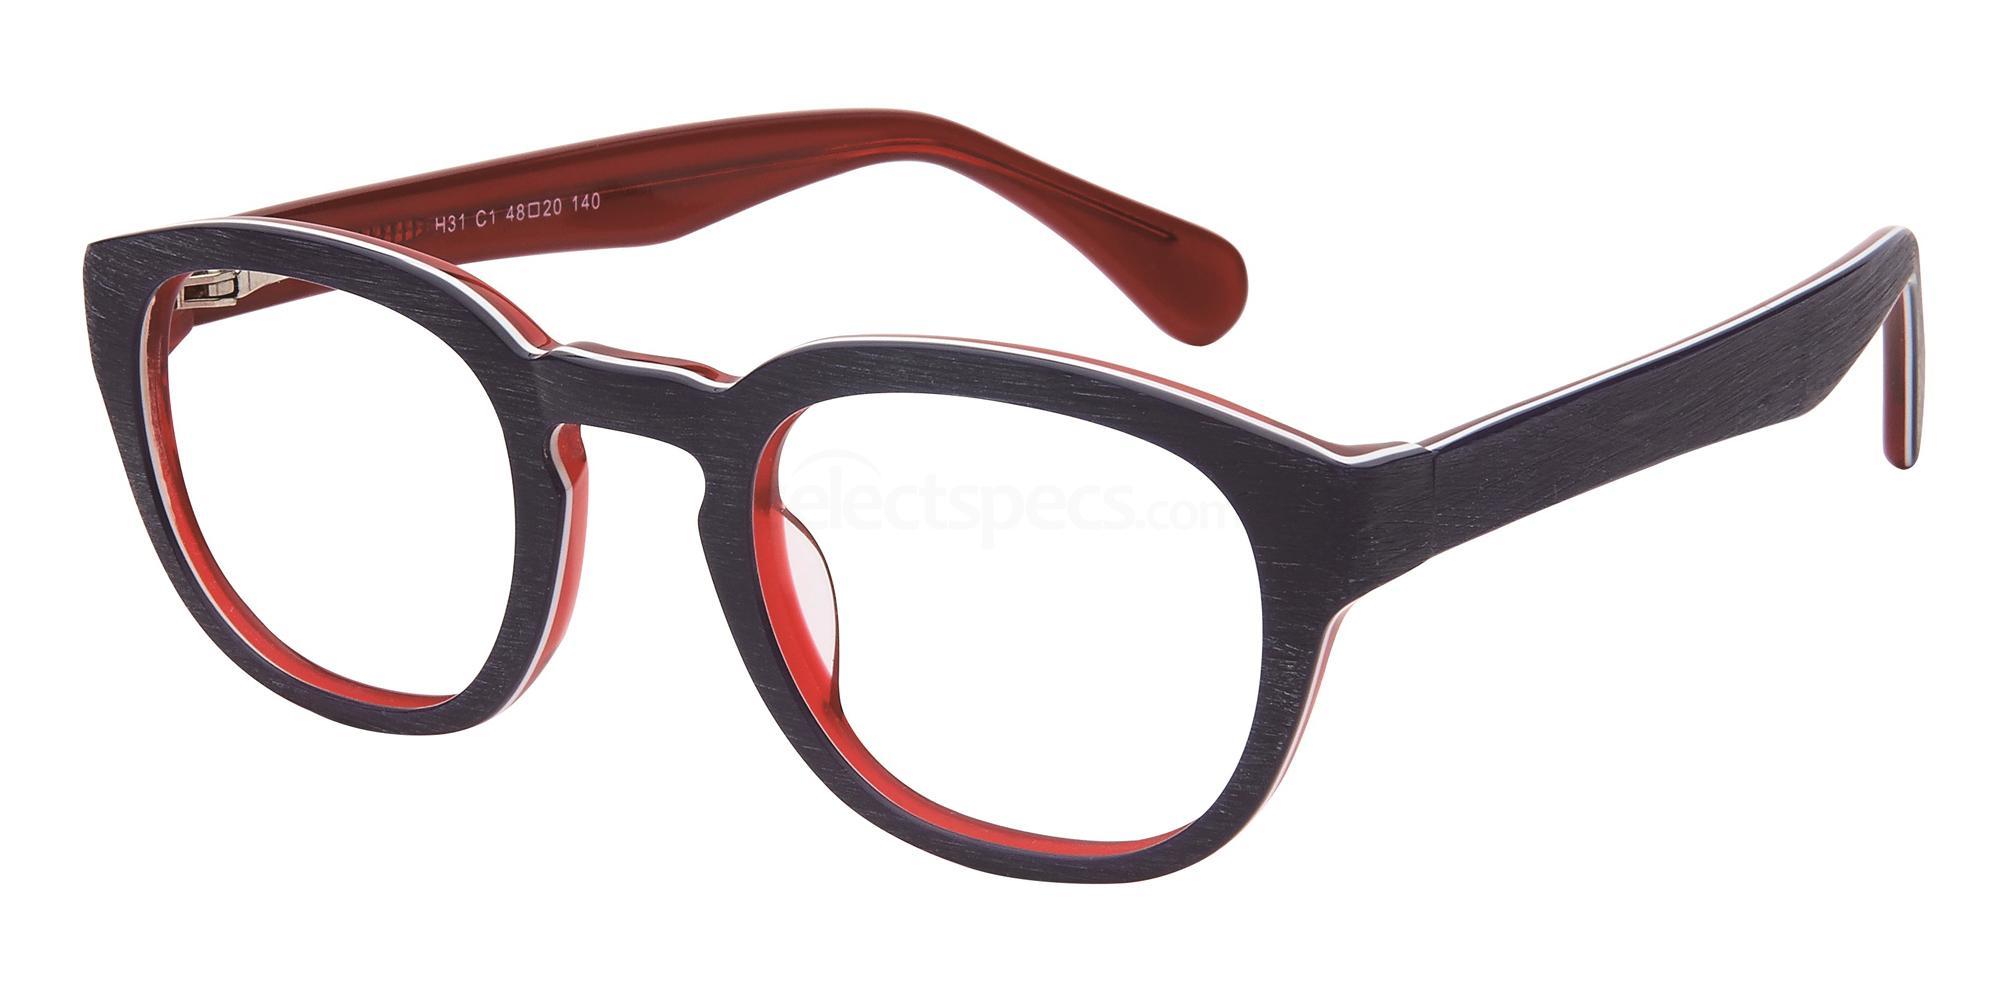 C1 H31 Glasses, Halstrom